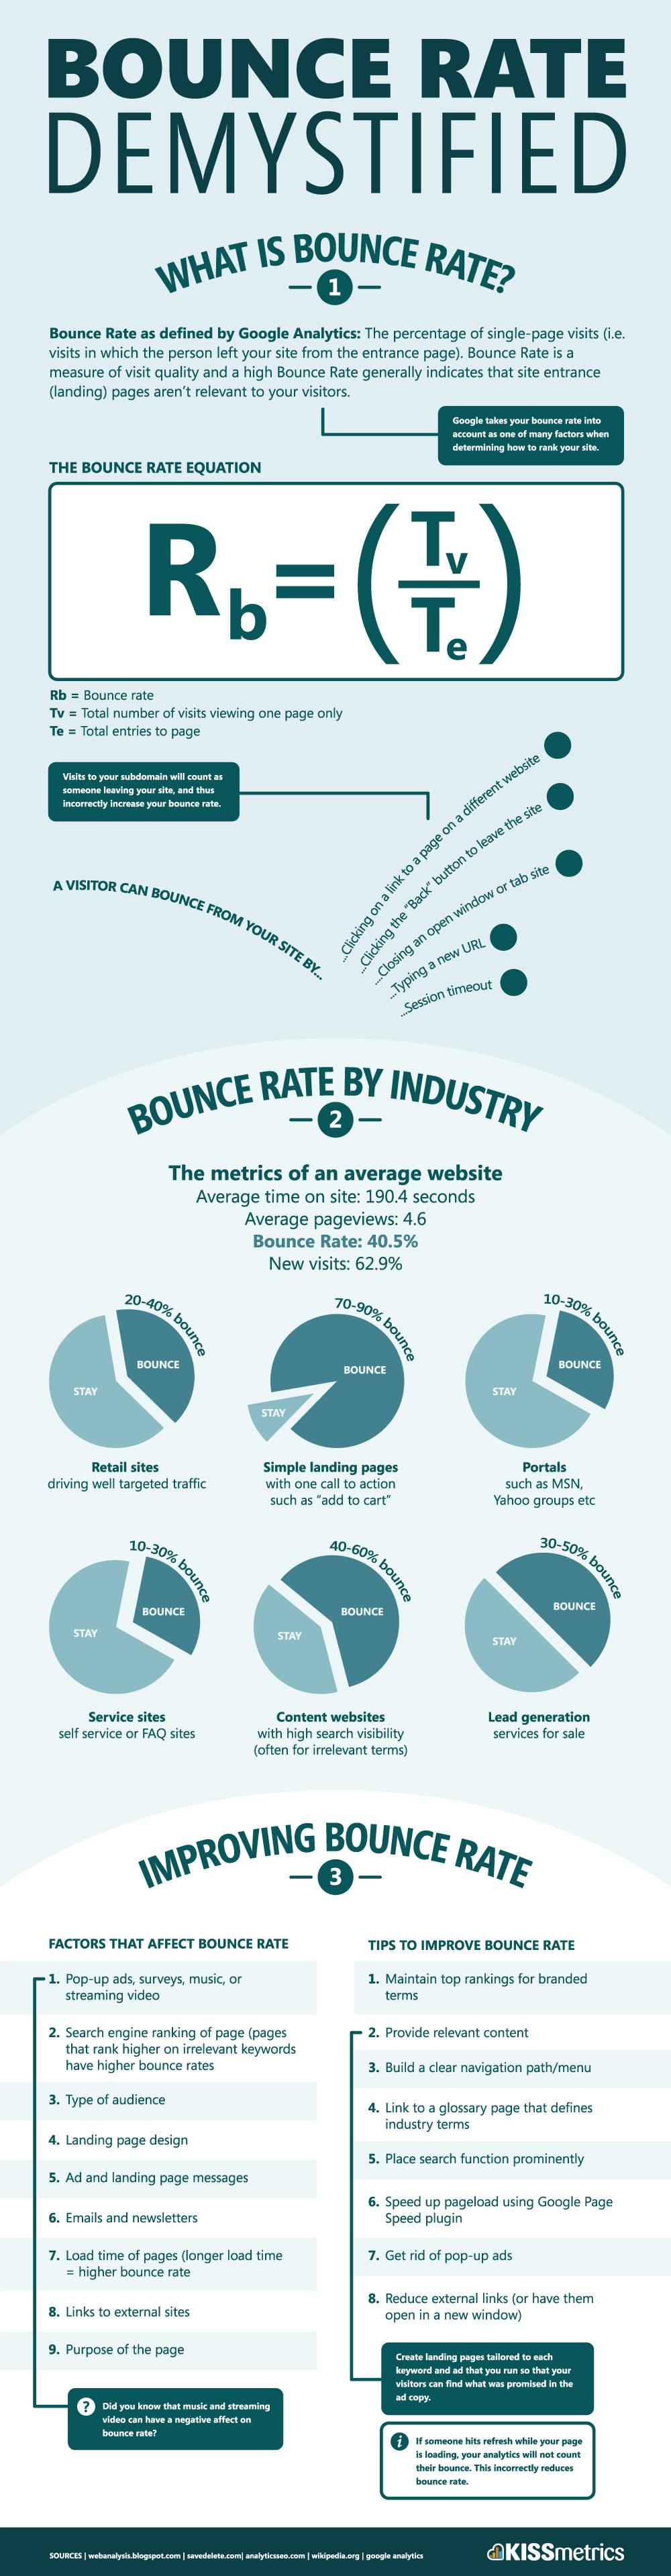 Quelle:https://blog.kissmetrics.com/bounce-rate/?wide=1